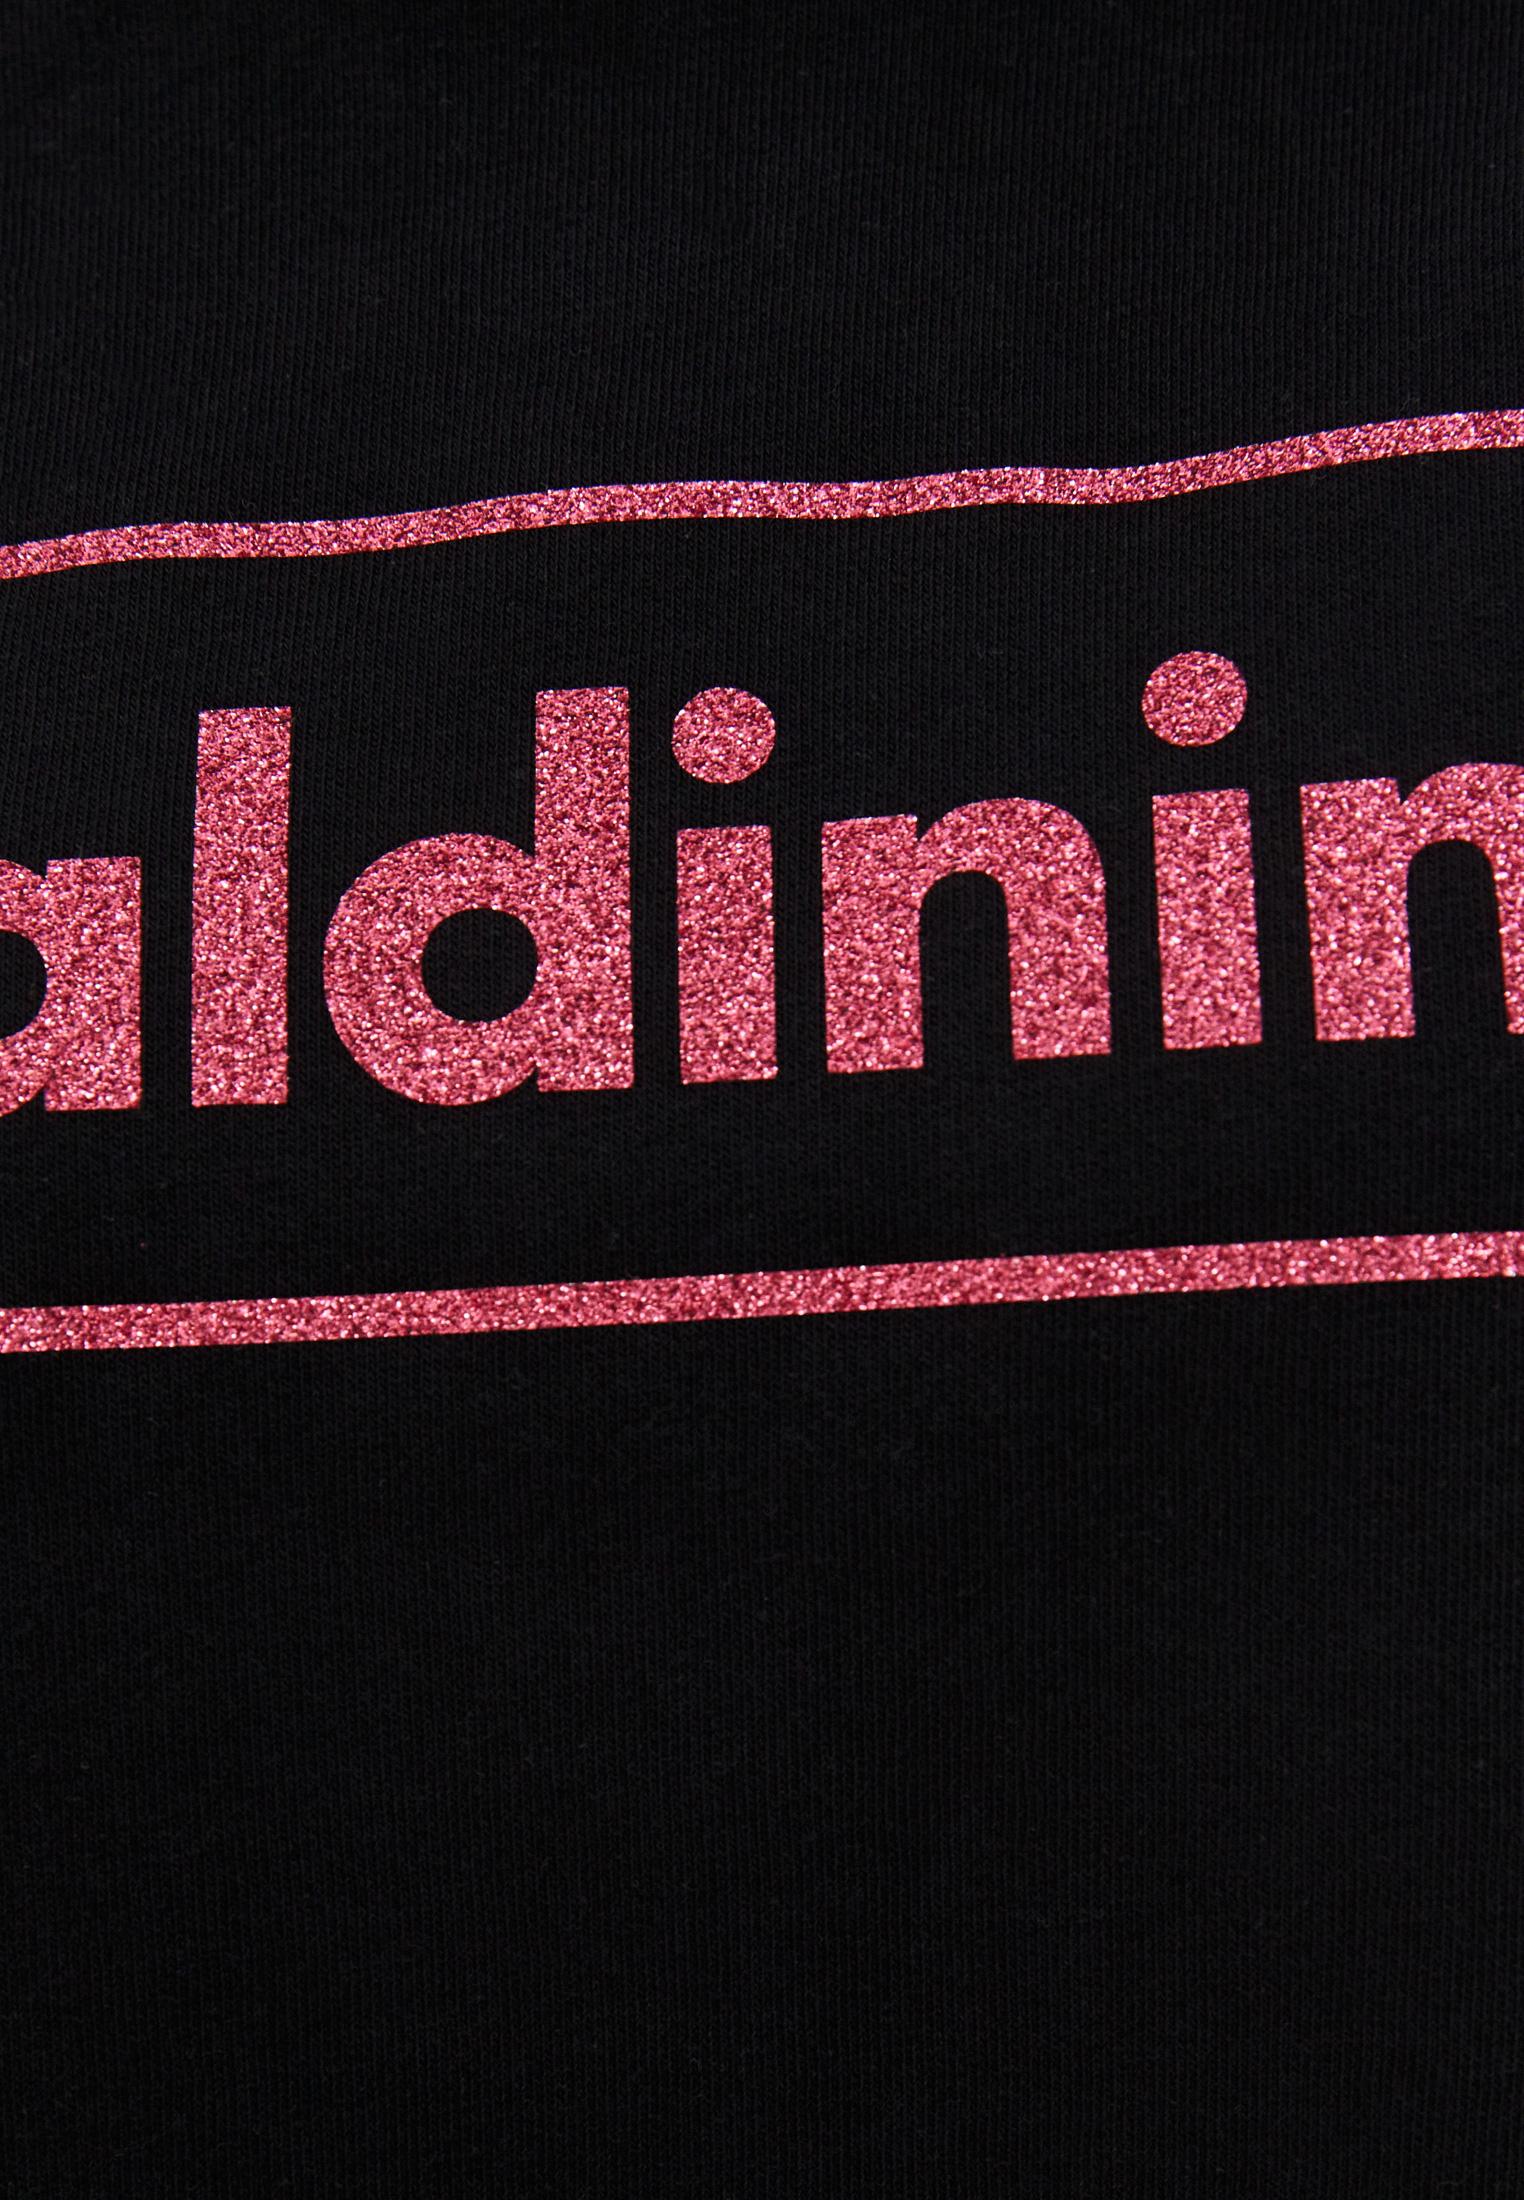 Свитер Baldinini (Балдинини) JJWR17K001FD01 VAR3G: изображение 5